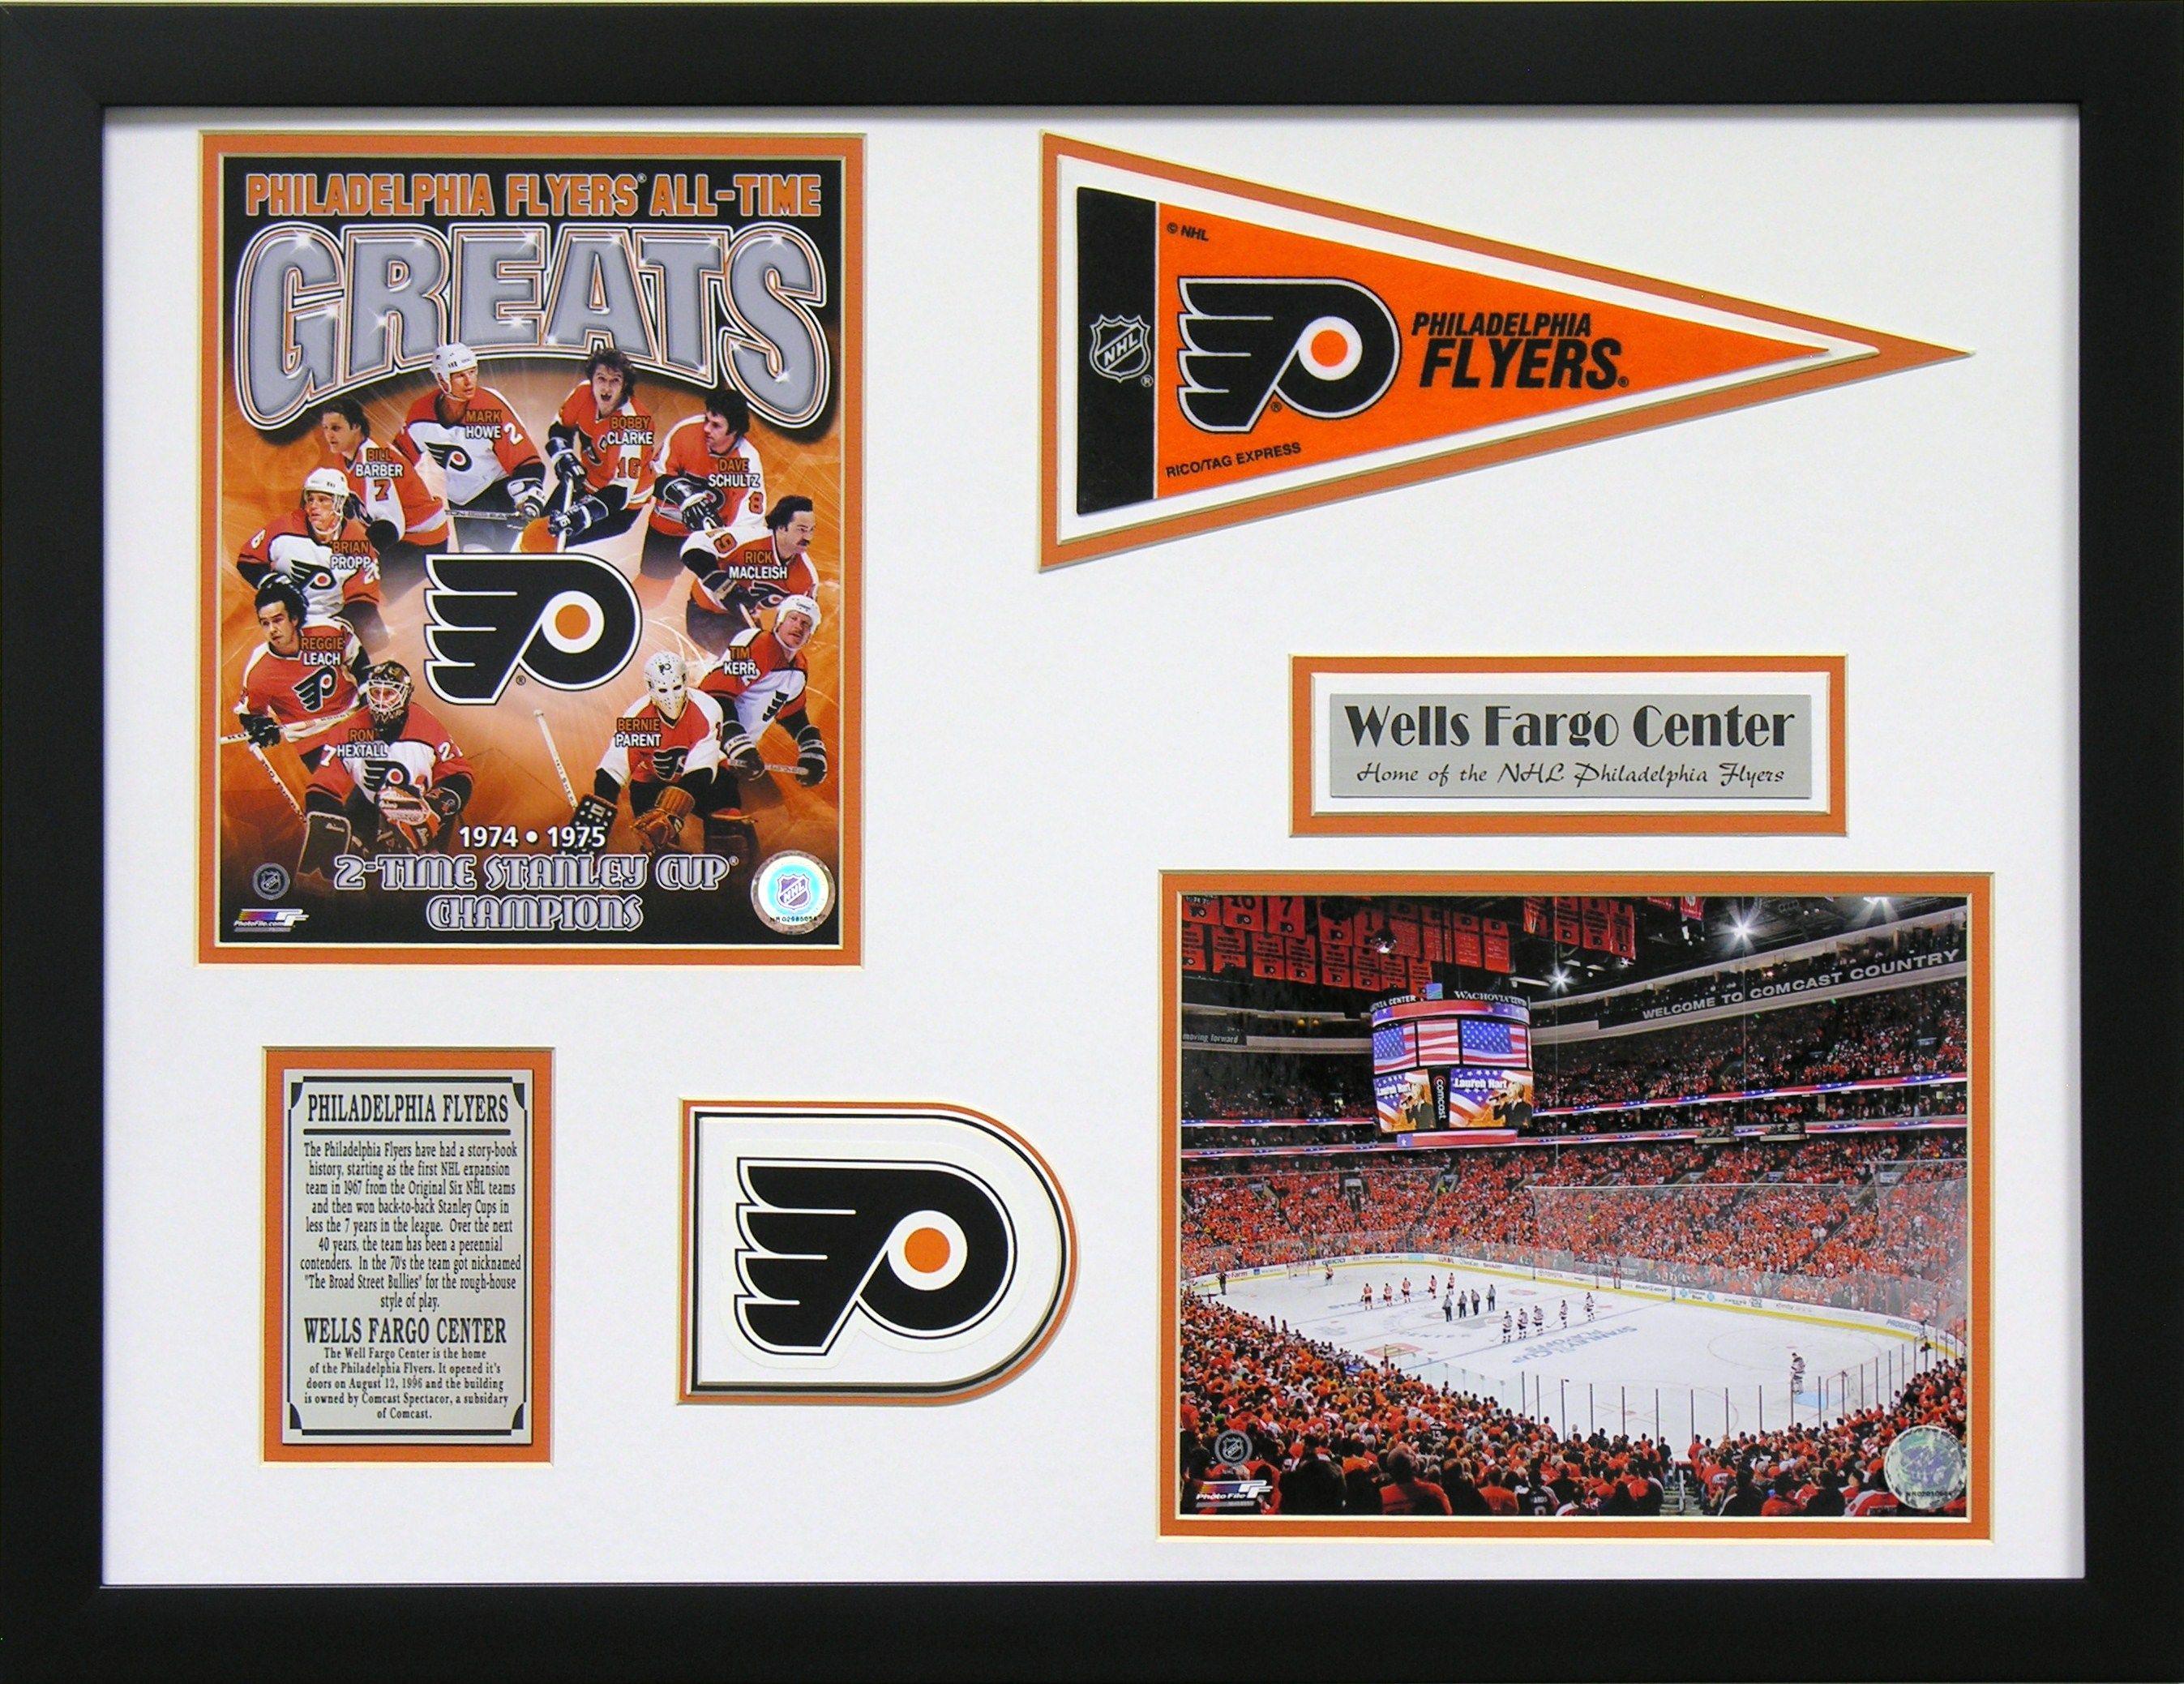 By The Bleachers Philadelphia Flyers Wells Fargo Center Framed Wall Art